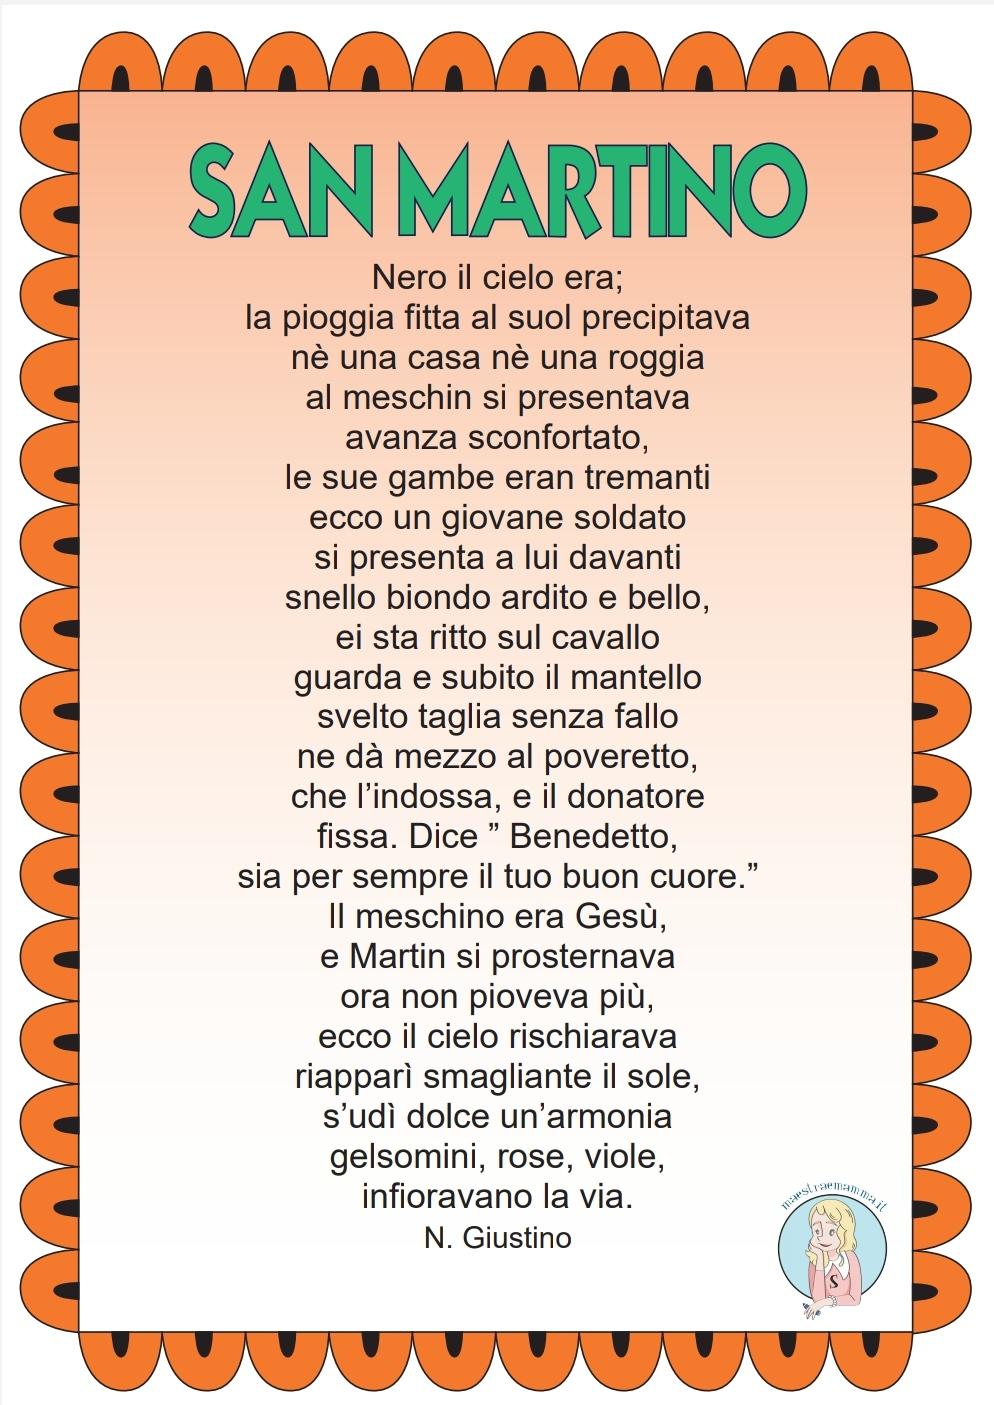 Poesia su San Martino